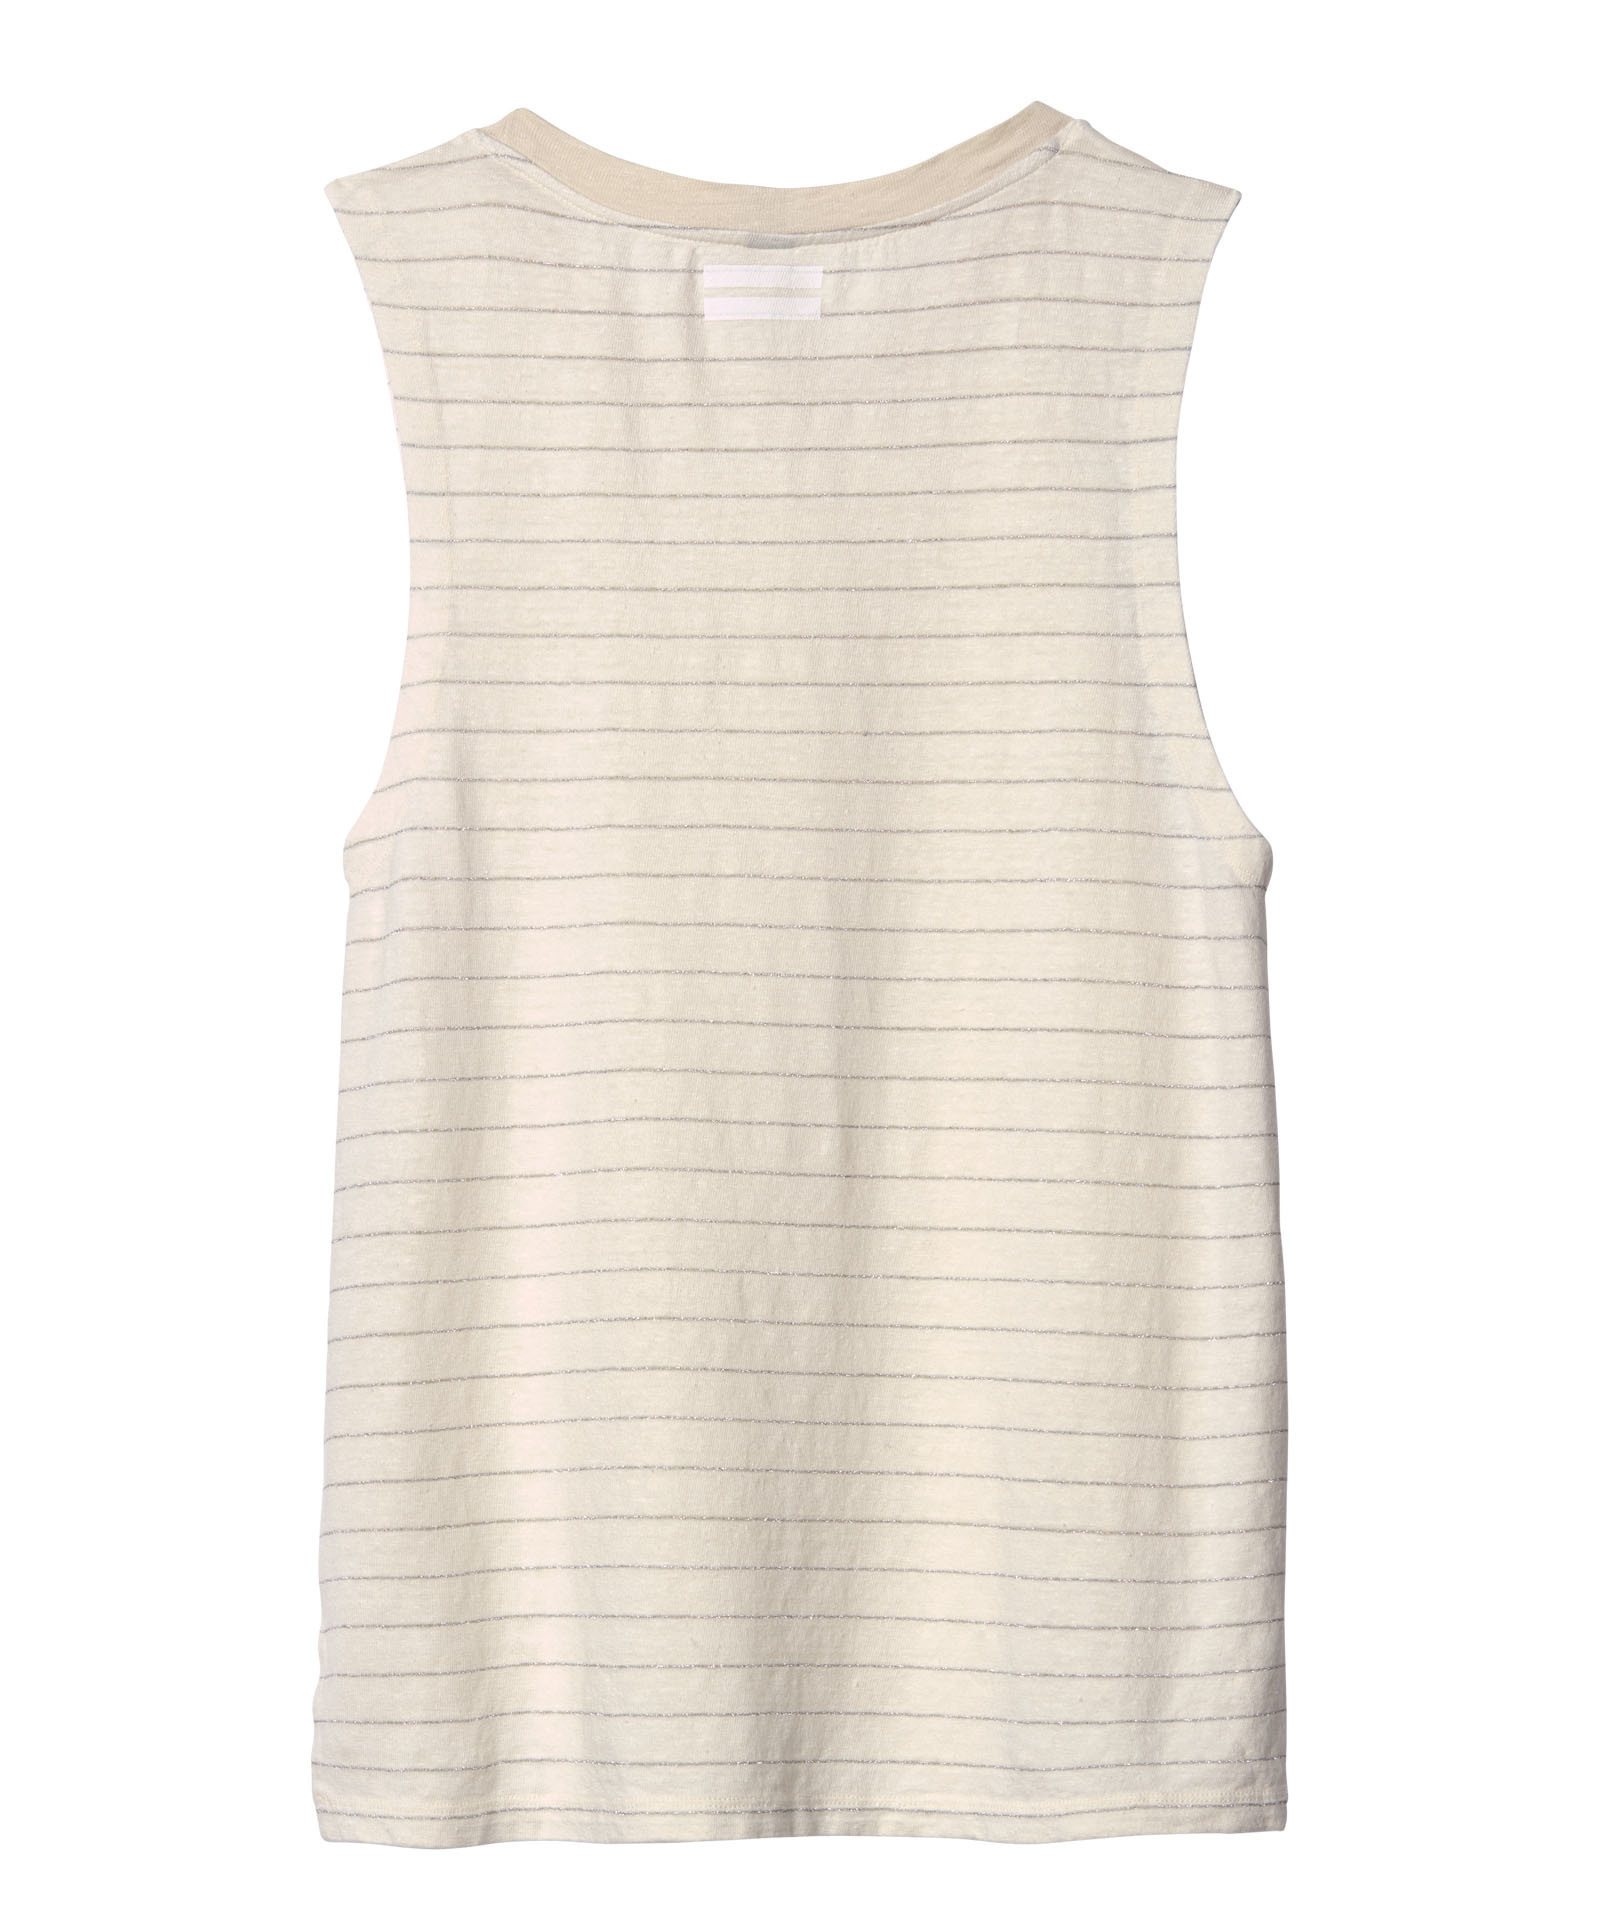 Top sleevelless stripes ecru-2